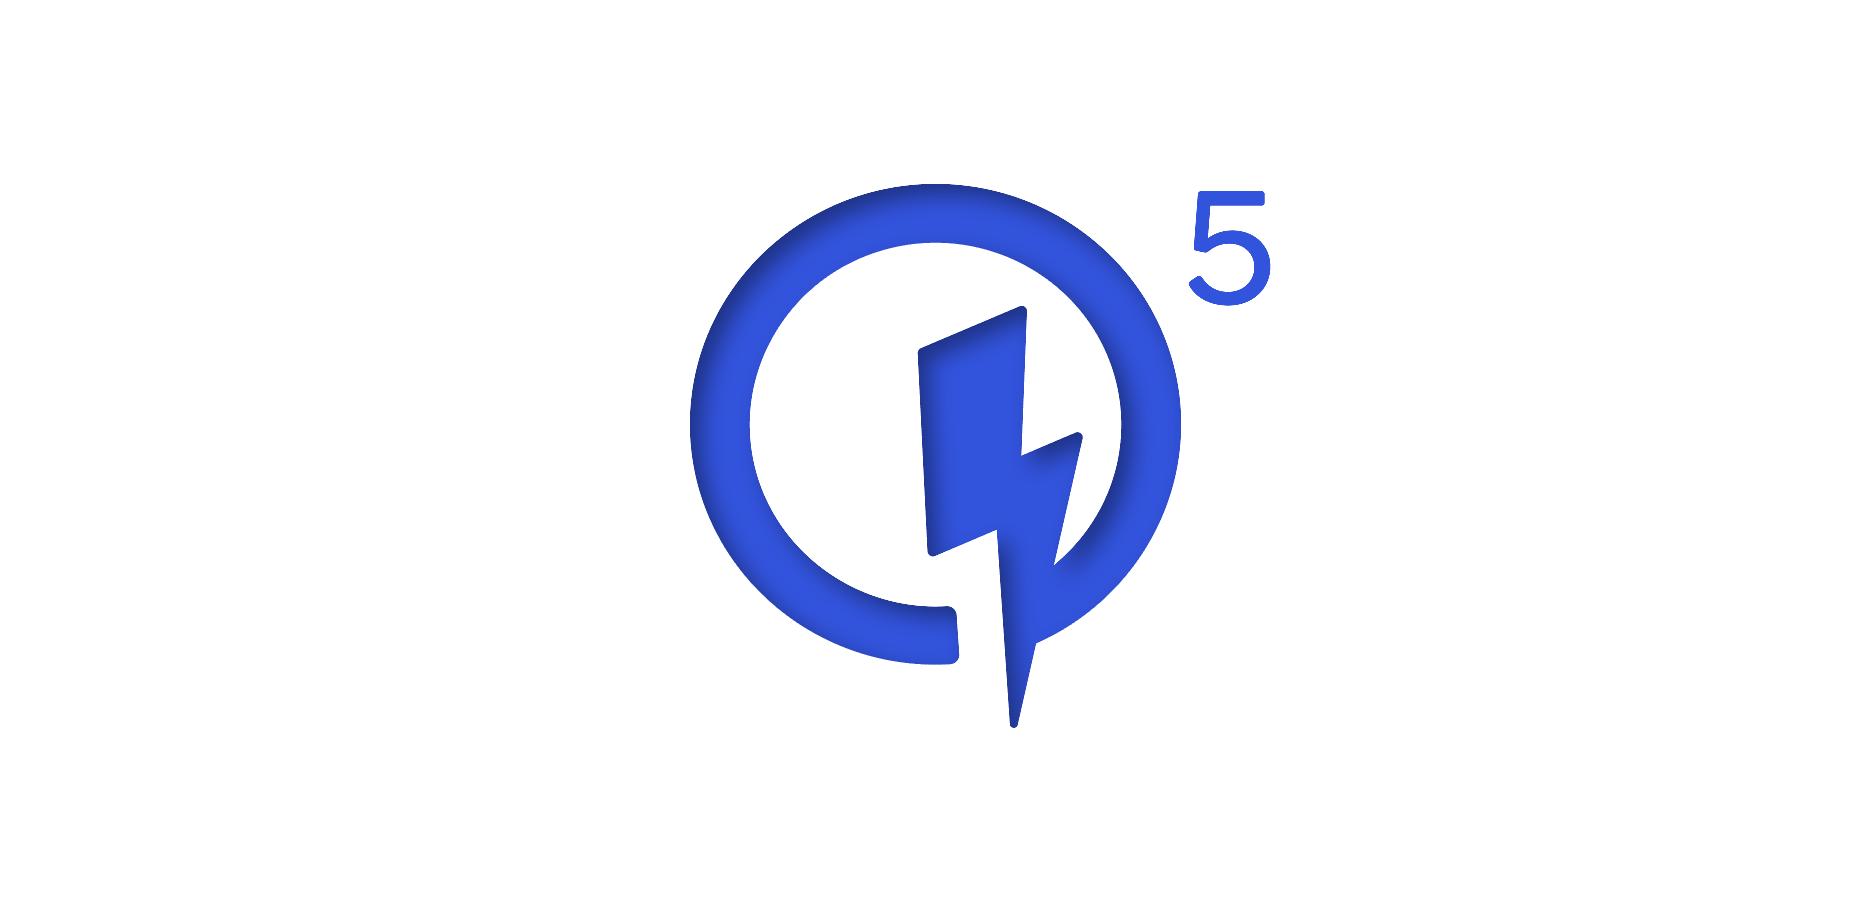 Qualcomm Quick Charge 5 logo